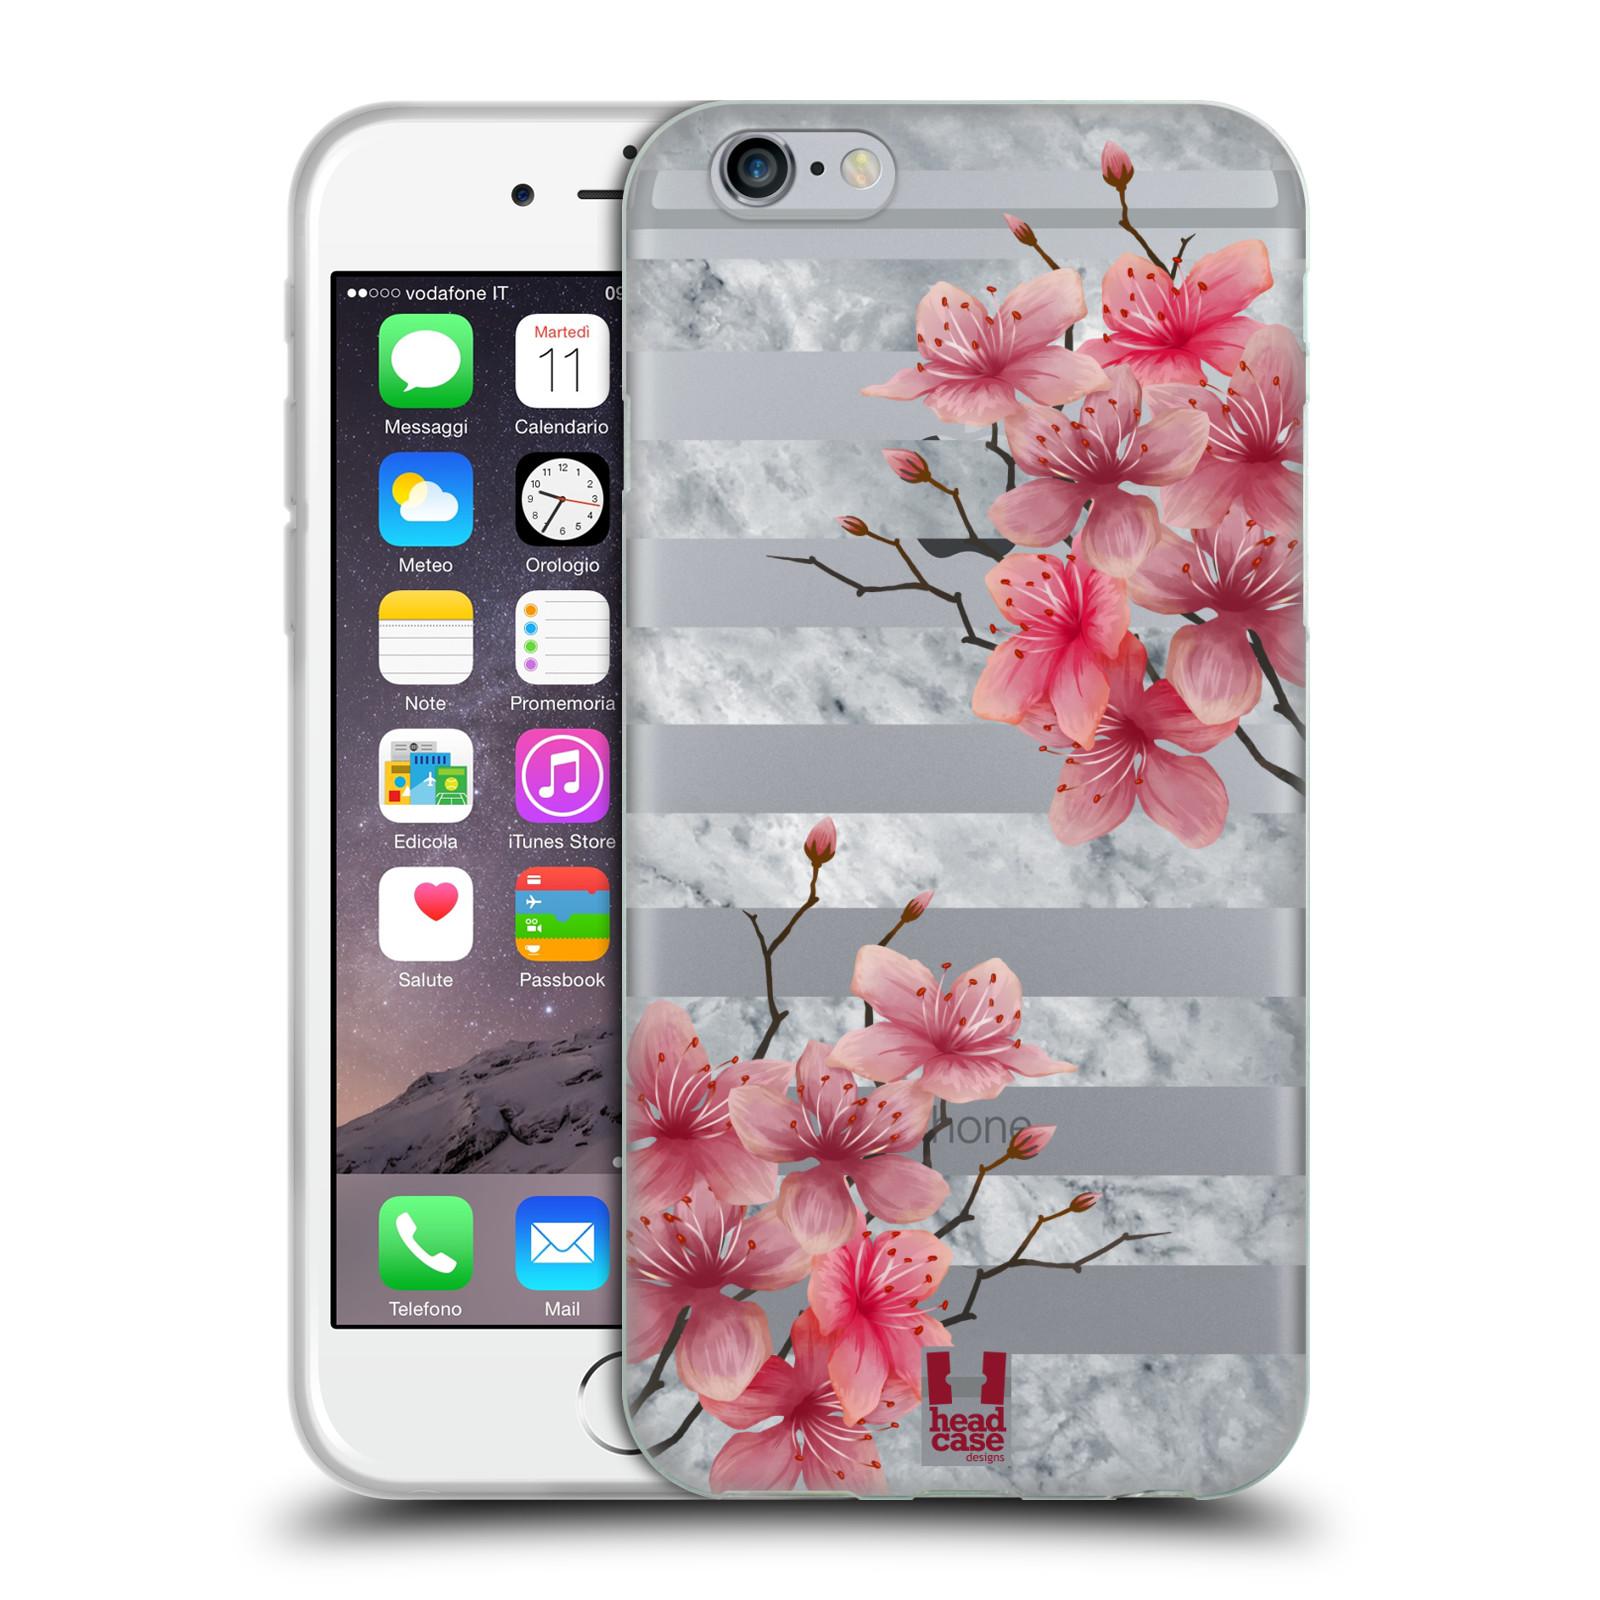 HEAD CASE silikonový obal na mobil Apple Iphone 6 6S růžové květy v rozkvětu  a mramor c5aaaac381c